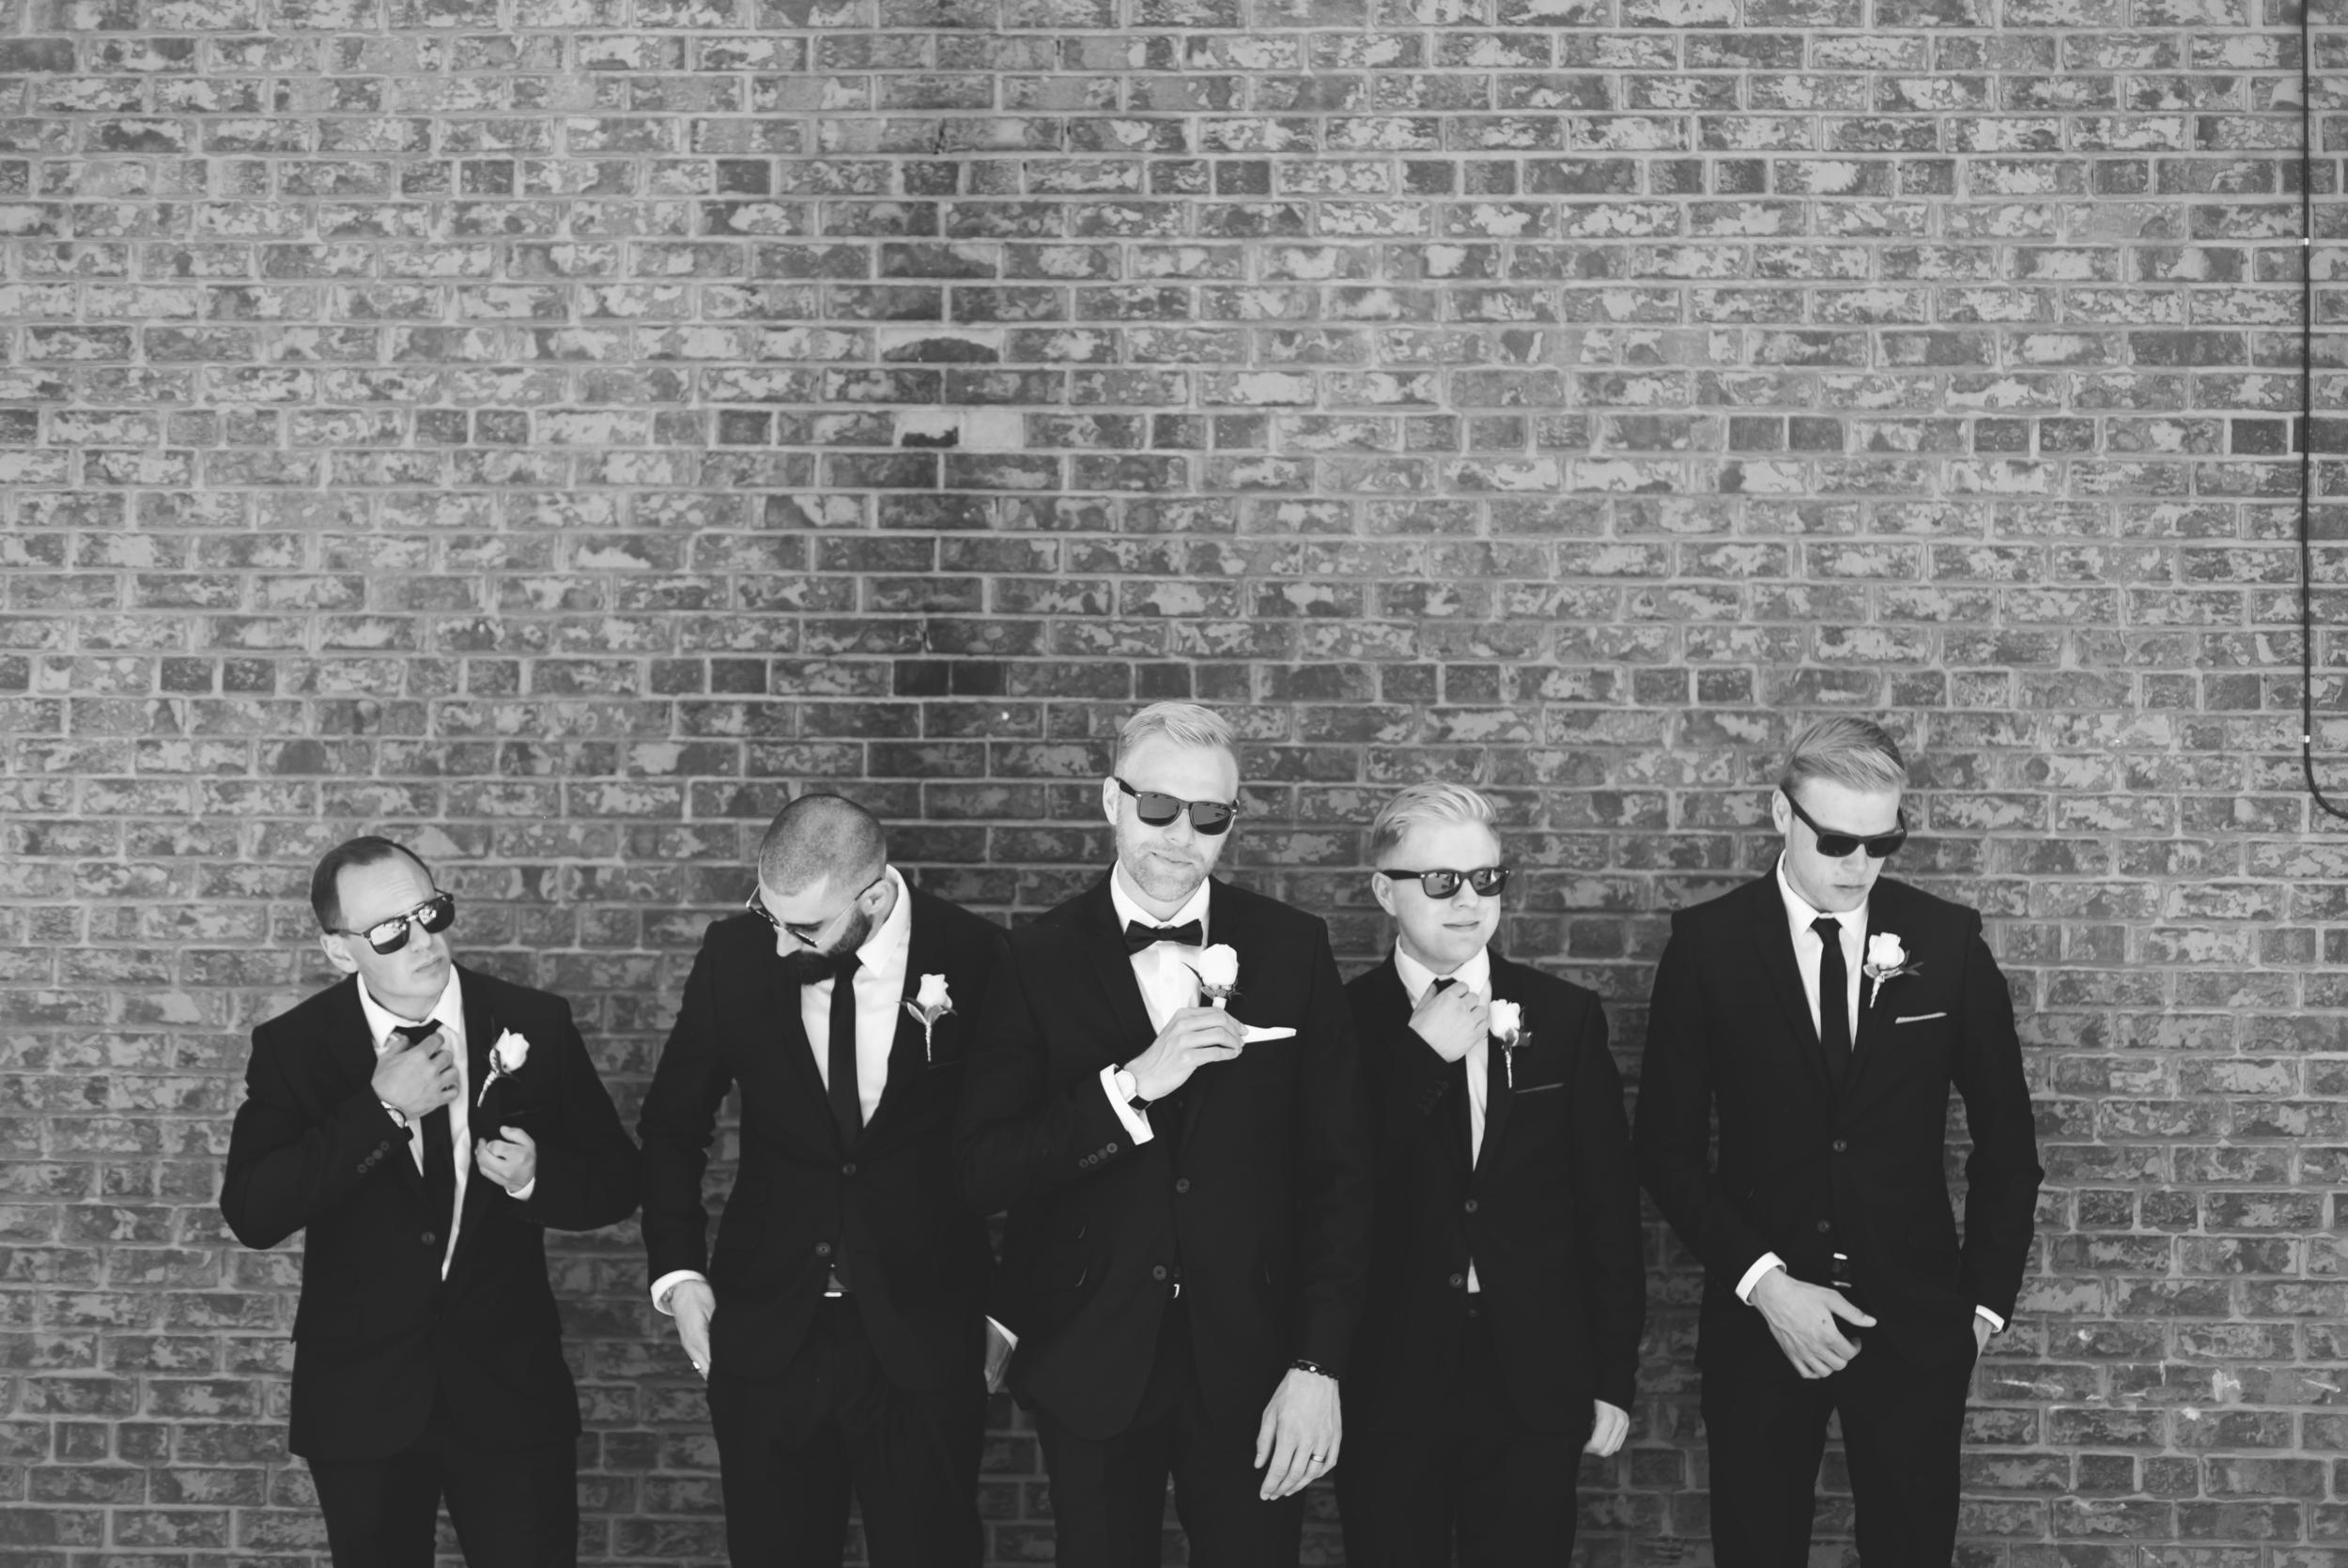 Wedding-Harbour-Banquet-Center-Oakville-Photographer-Wedding-Hamilton-Saint-James-Espresso-Downtown-HamOnt-GTA-Niagara-Toronto-Moments-by-Lauren-Photography-Photo-Image-37.png